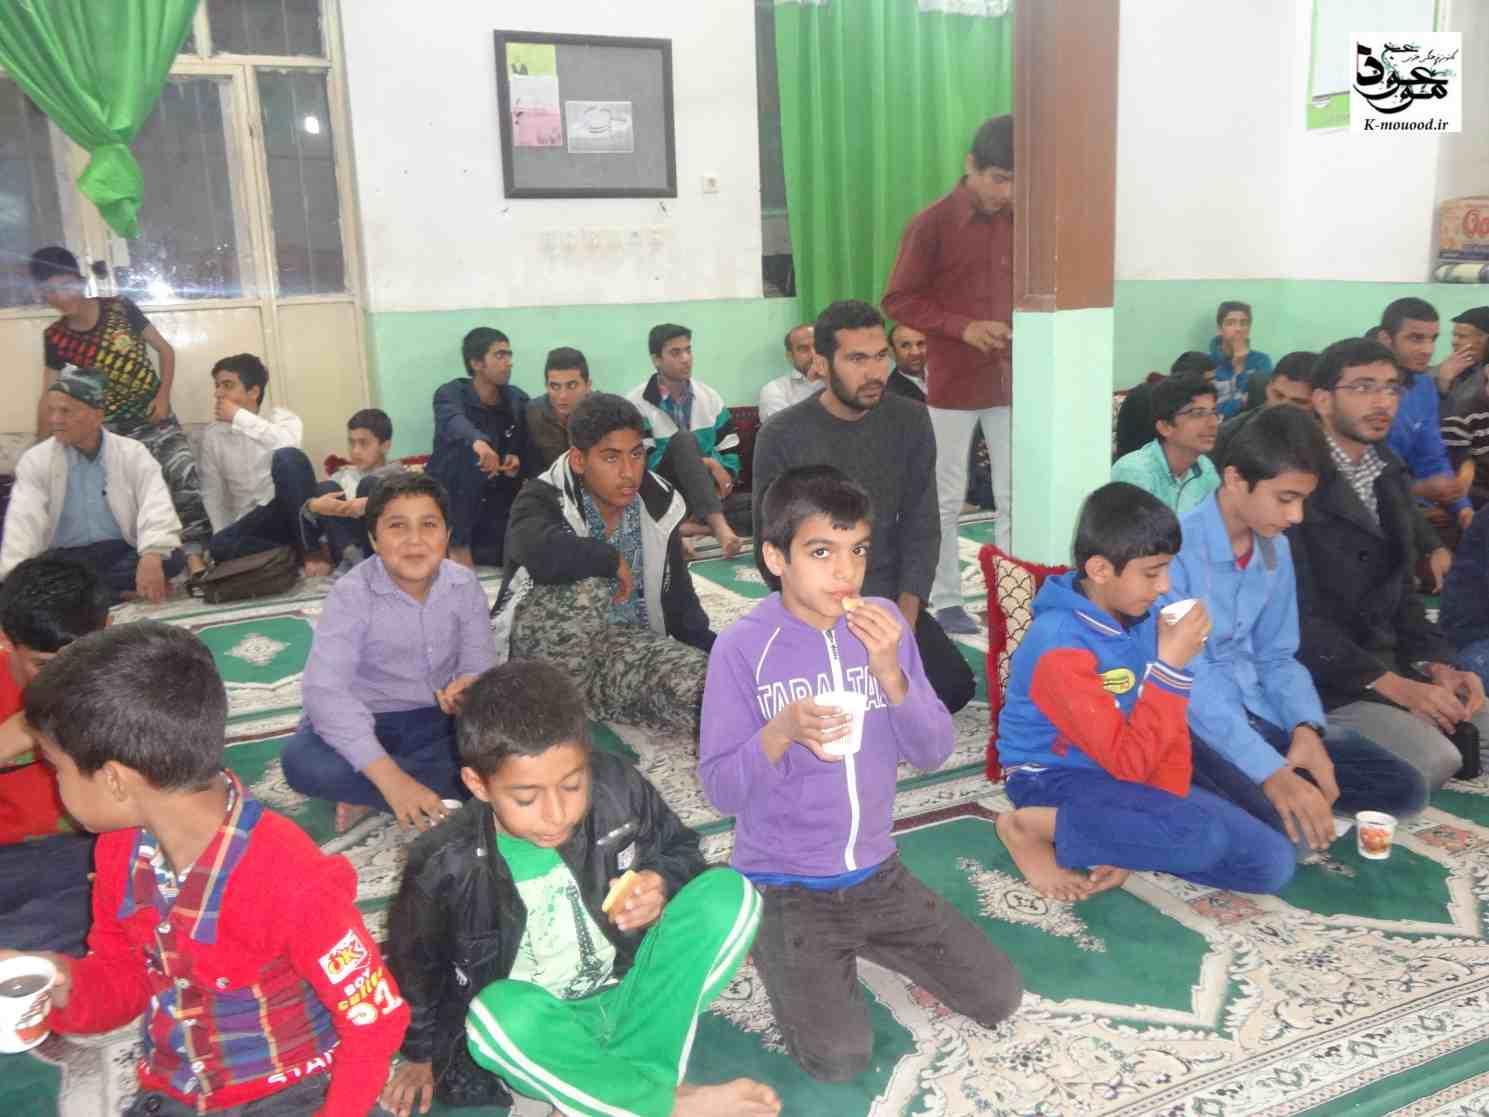 جشن انقلاب بهمن 94 (11)